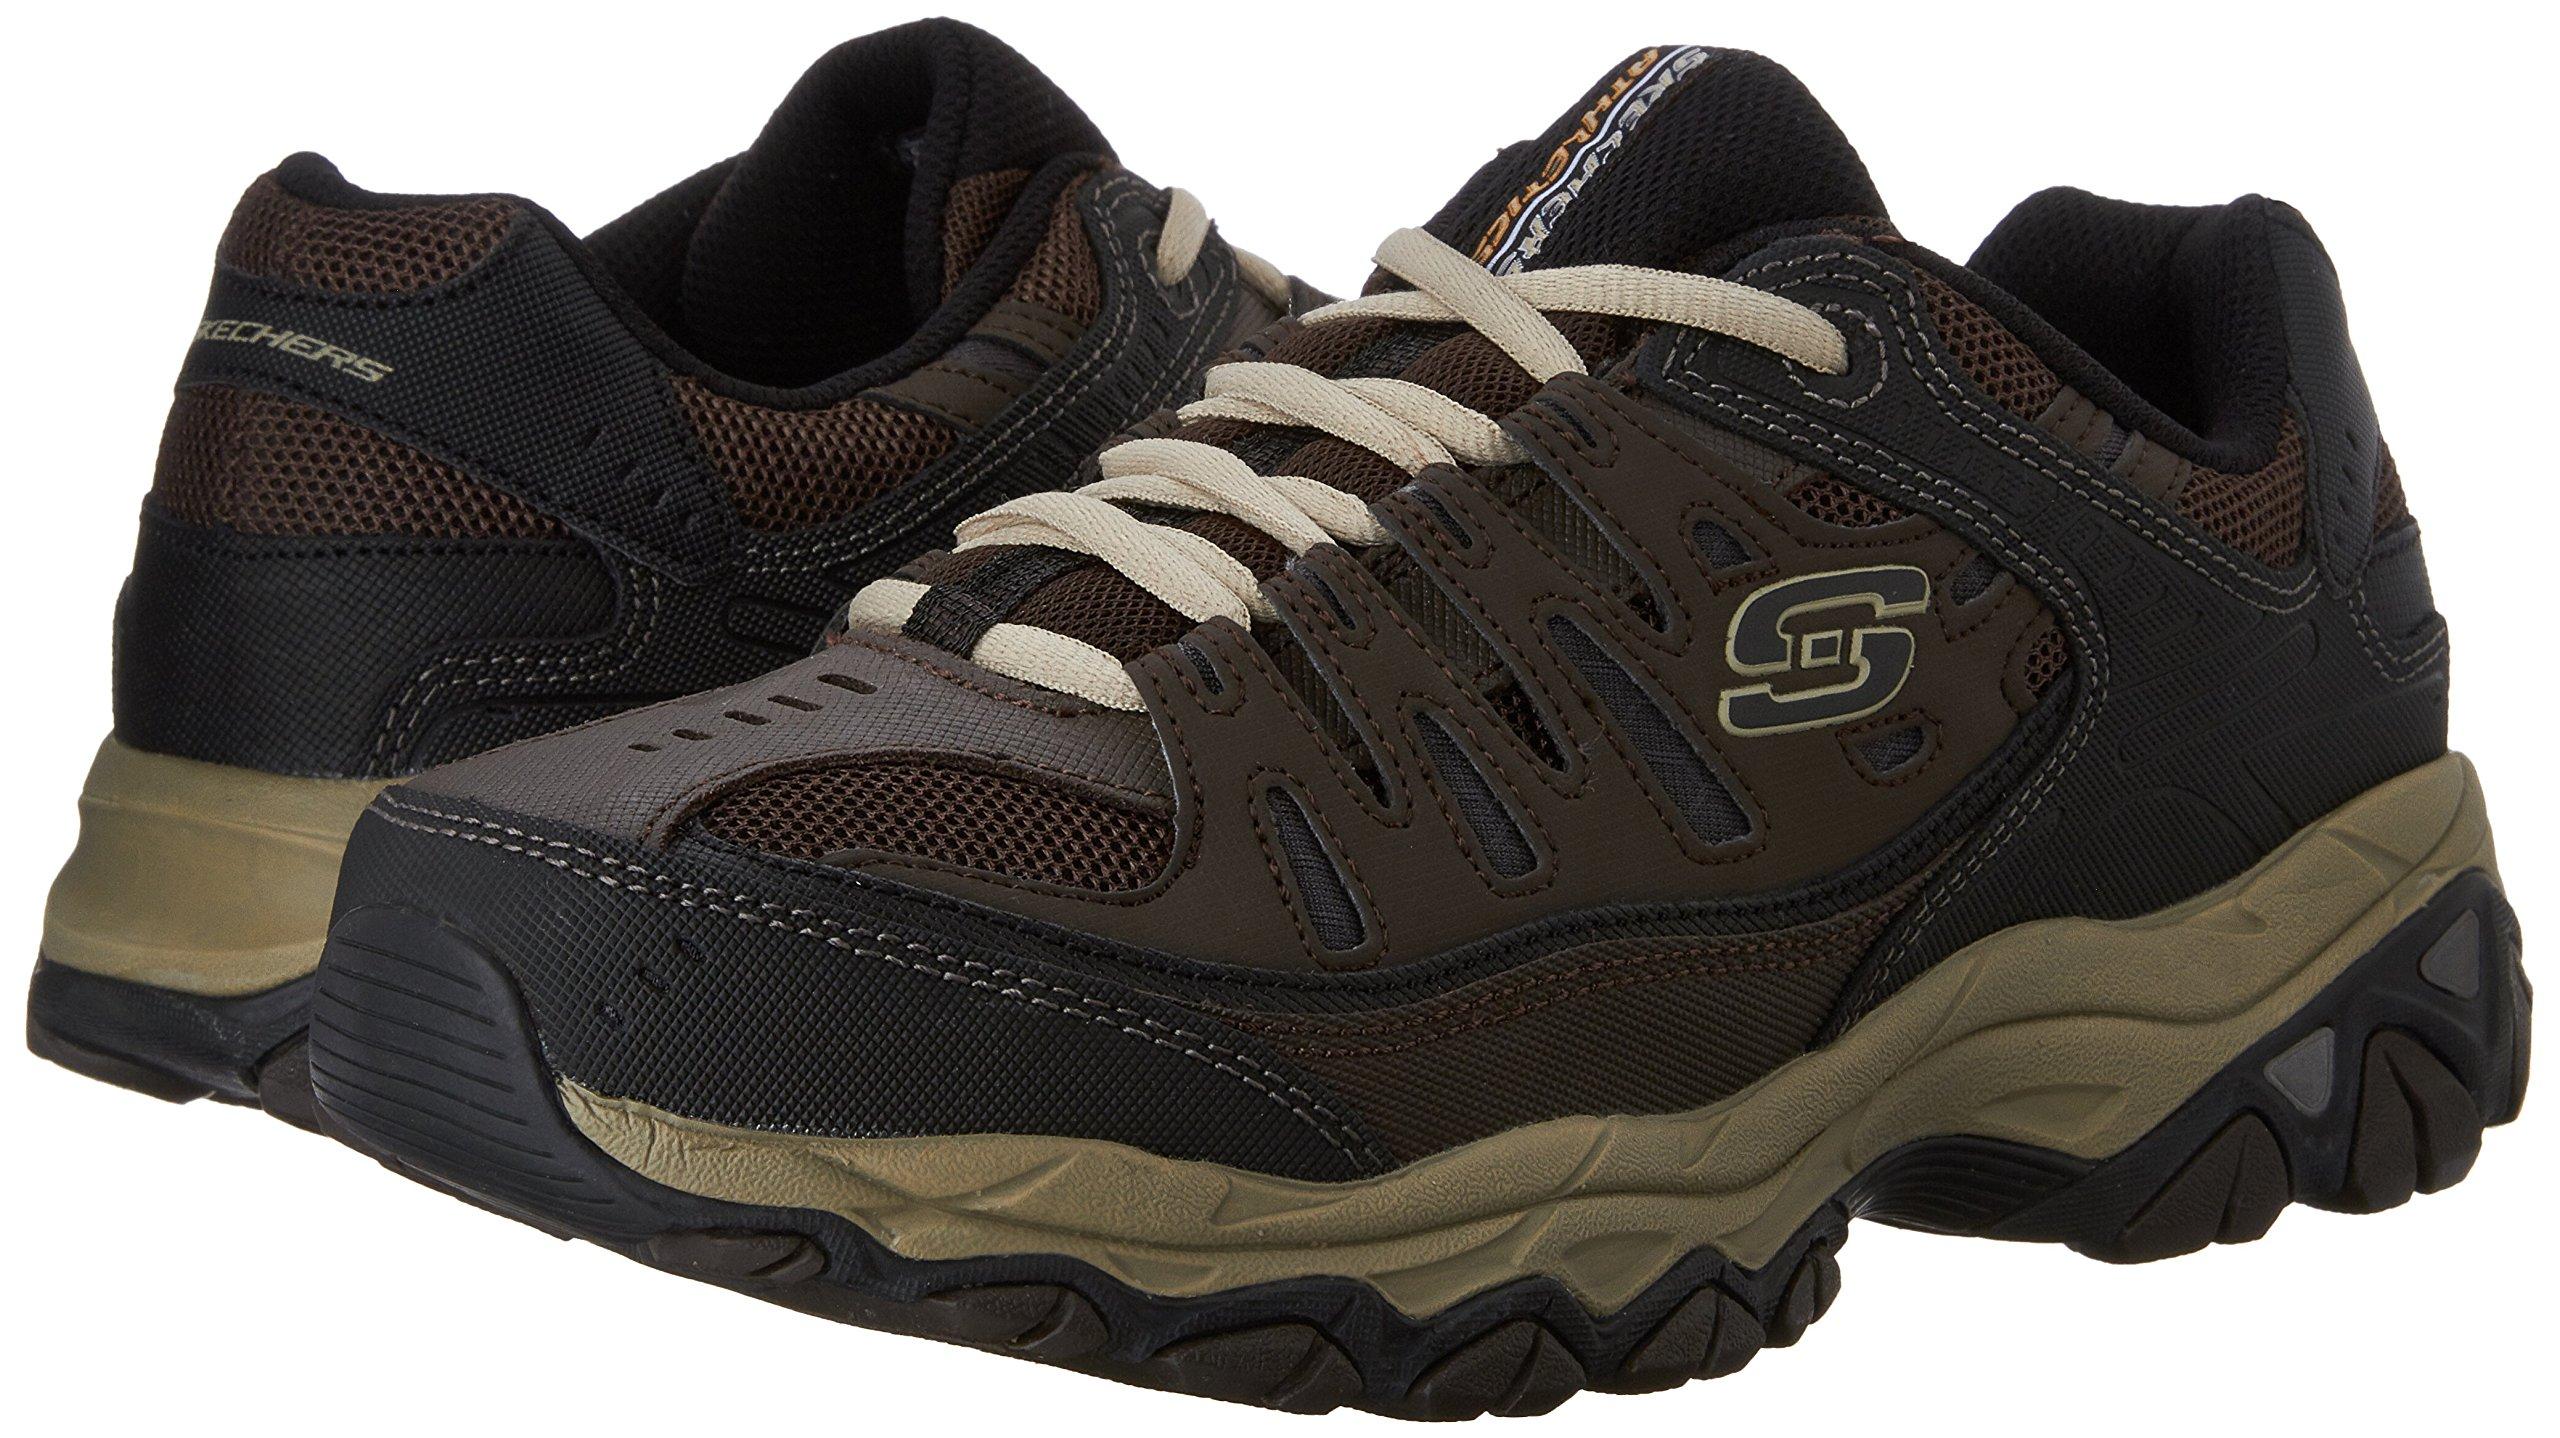 Skechers Men's AFTERBURNM.FIT Memory Foam Lace-Up Sneaker, Brown/Taupe, 7 M US by Skechers (Image #6)